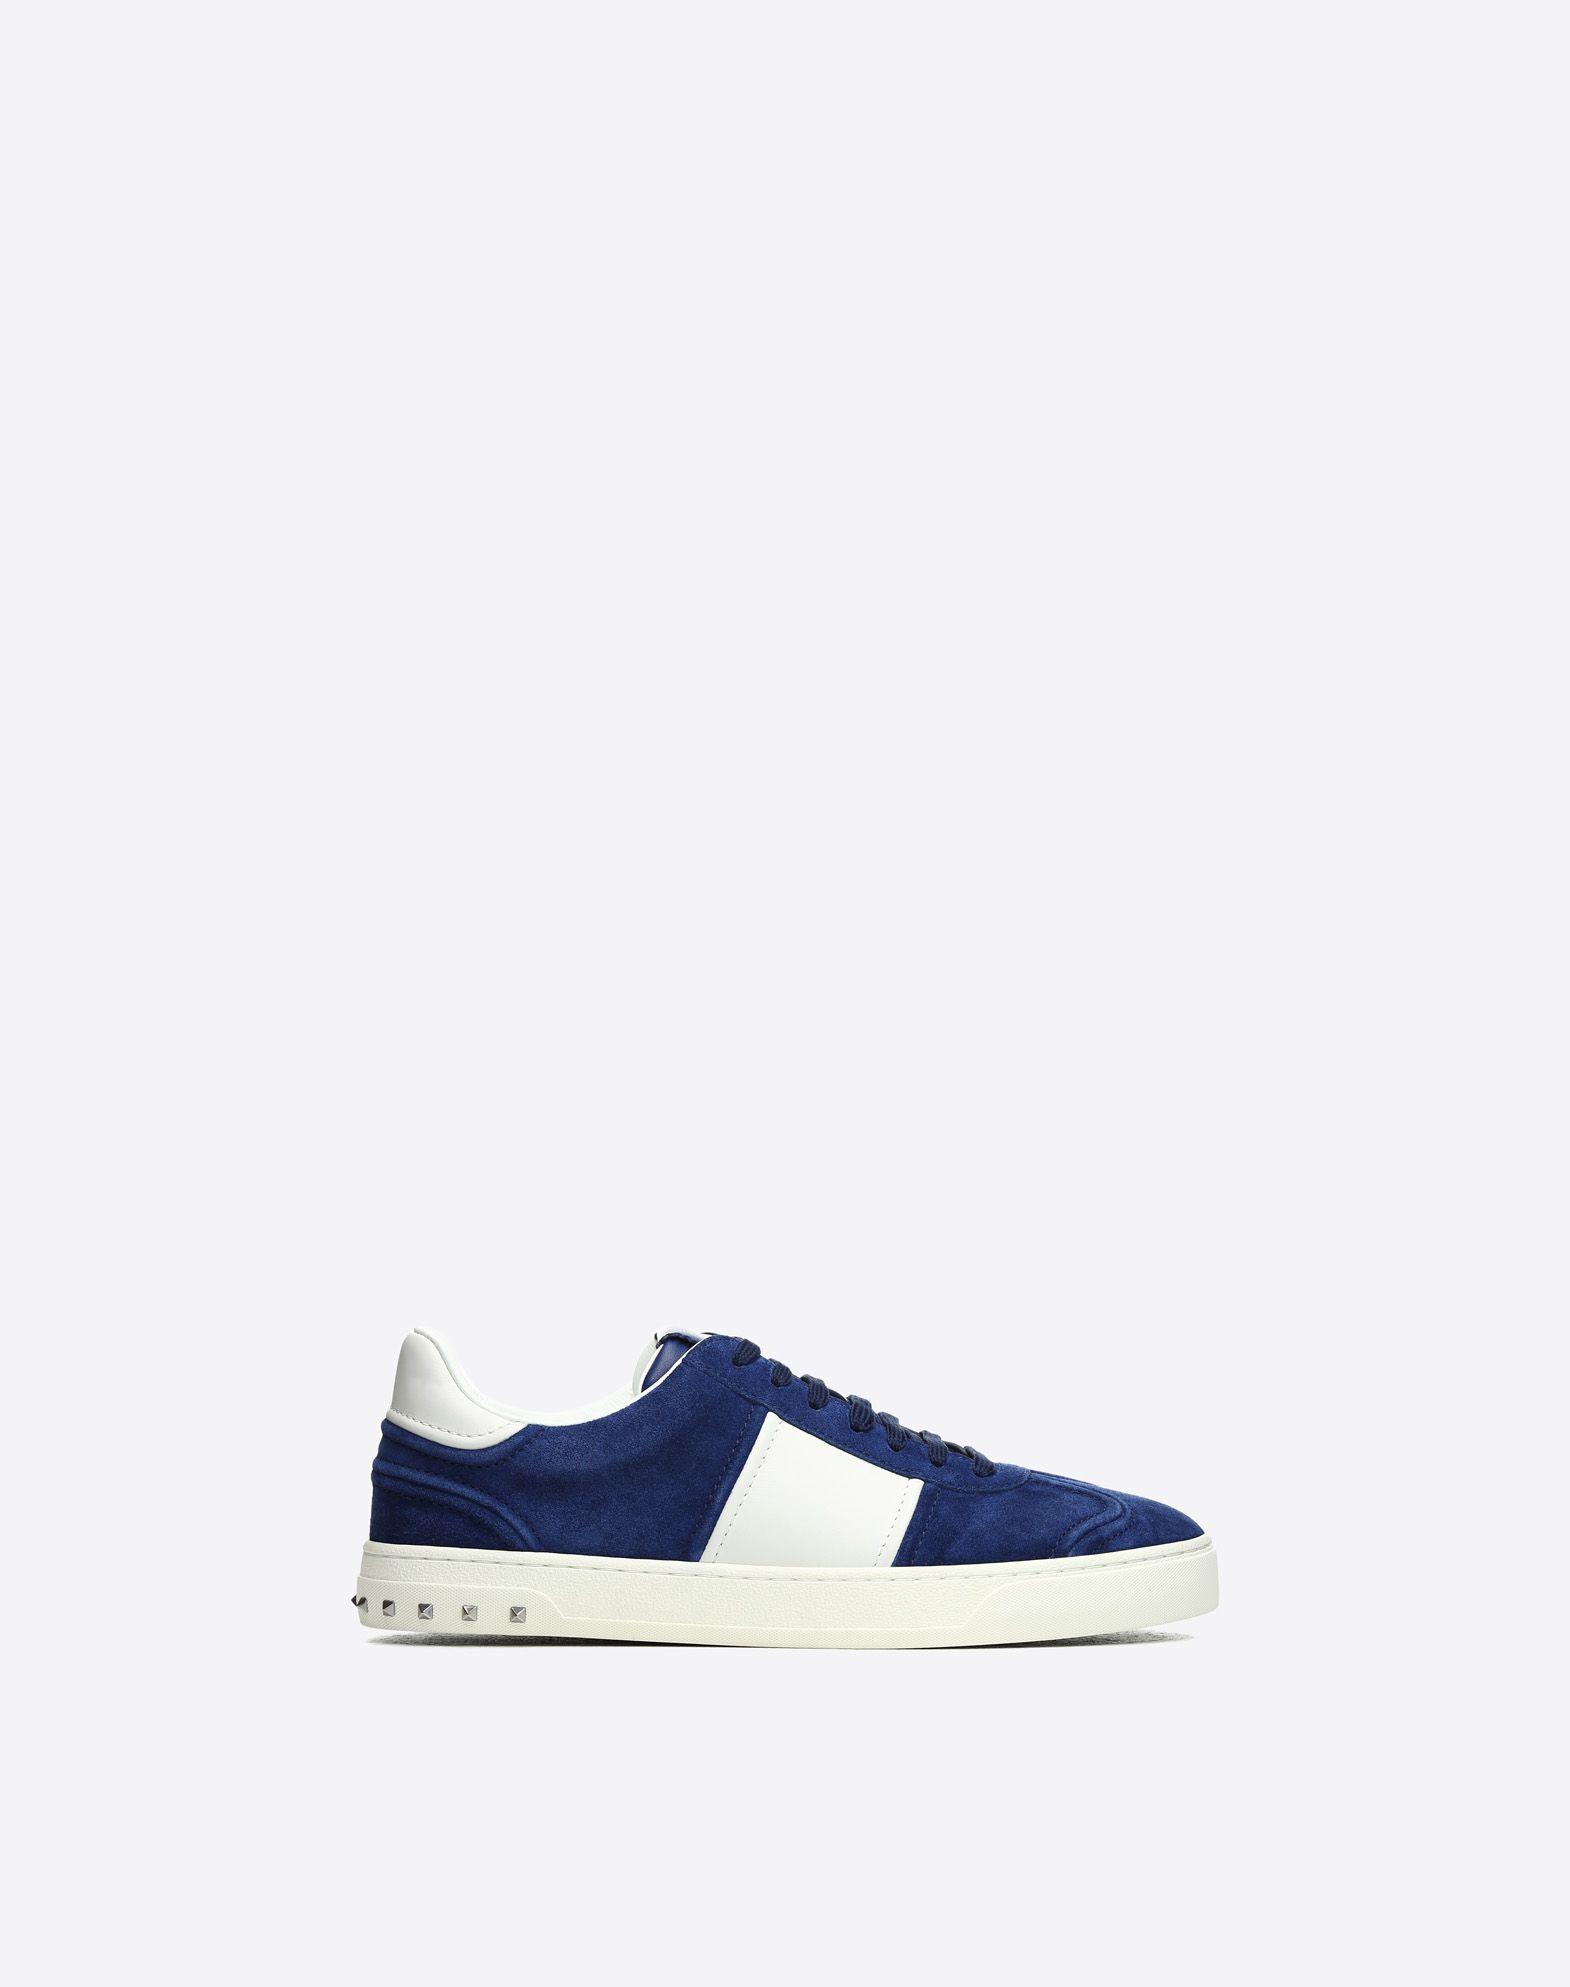 VALENTINO GARAVANI UOMO Flycrew Sneakers  LOW-TOP SNEAKERS U f